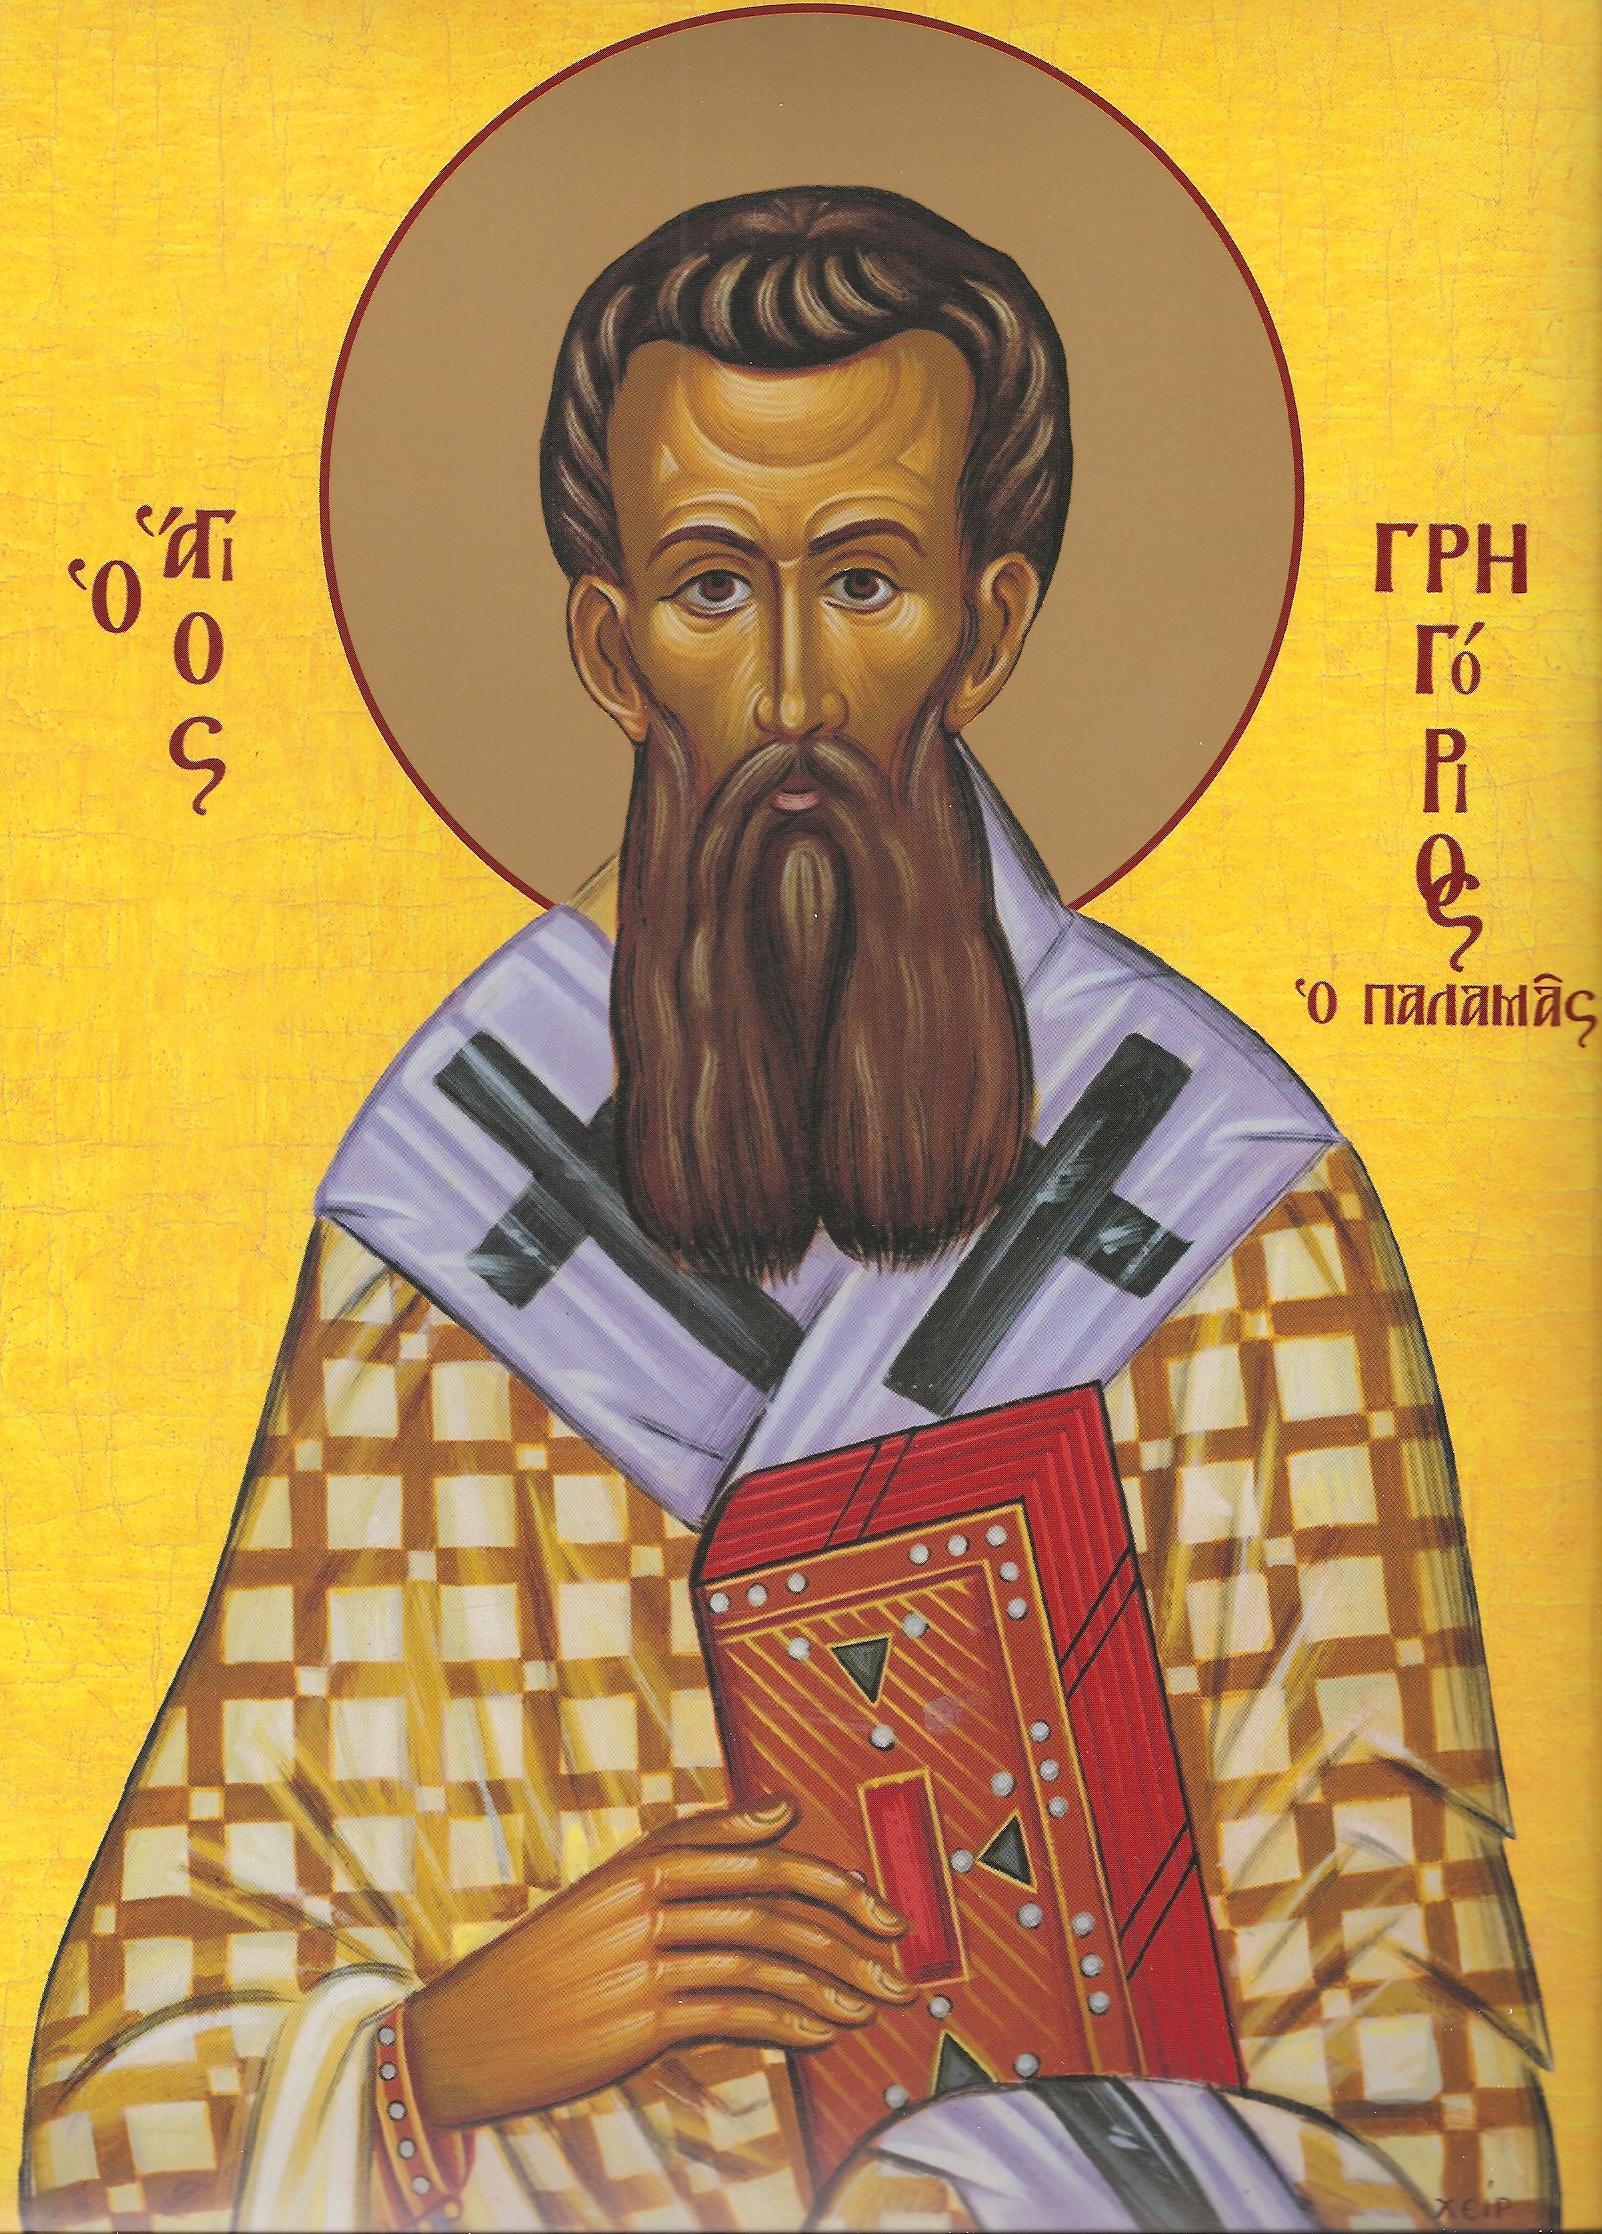 Saint Gregory the Wonderworker, Archbishop of Thessaloniki